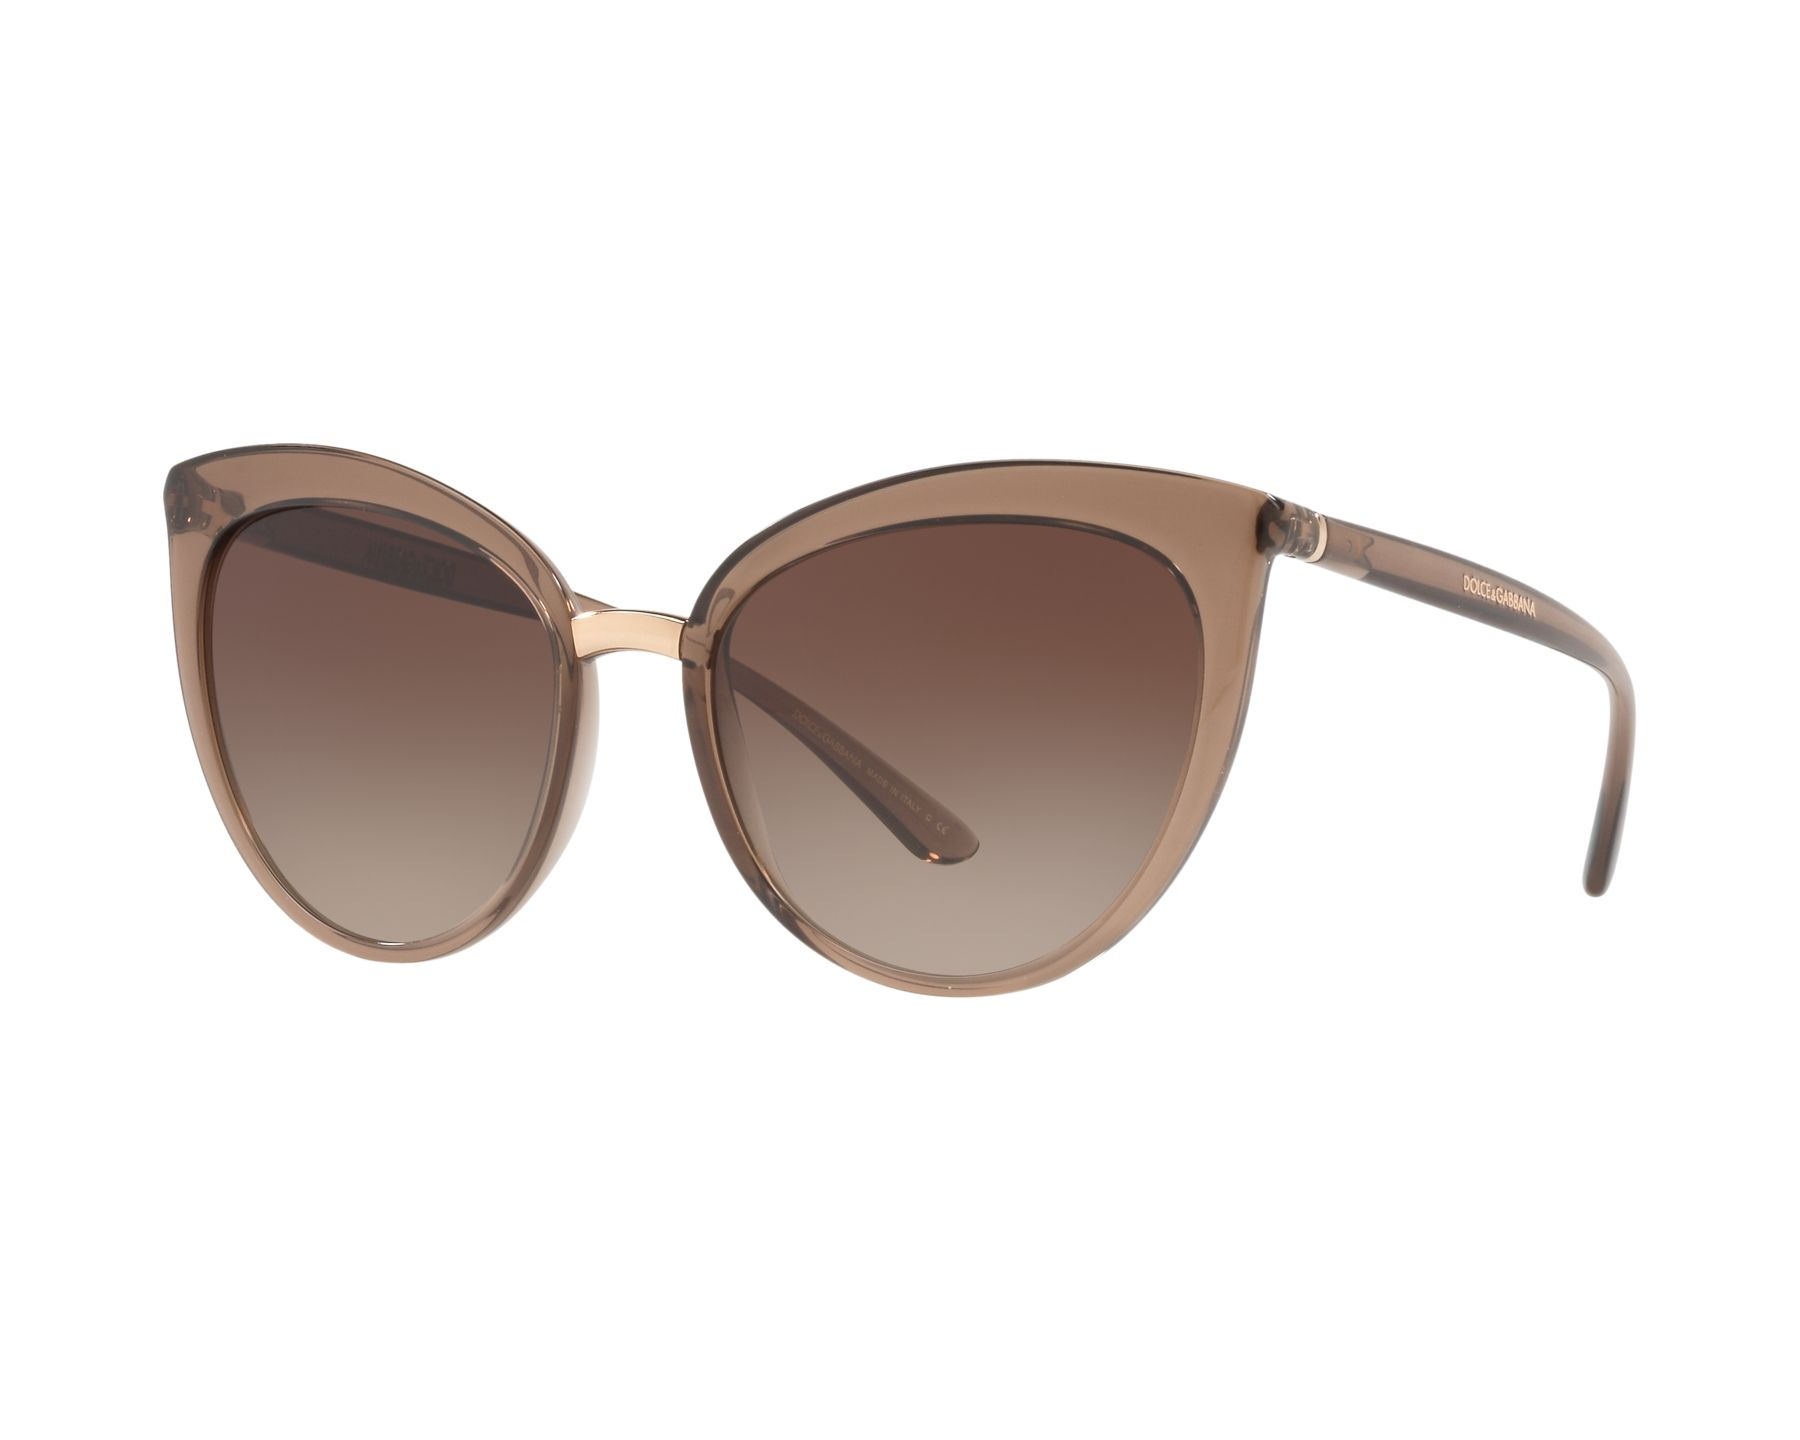 68ebf45c58 Sunglasses Dolce   Gabbana DG-6113 315913 55-18 Brown Brown